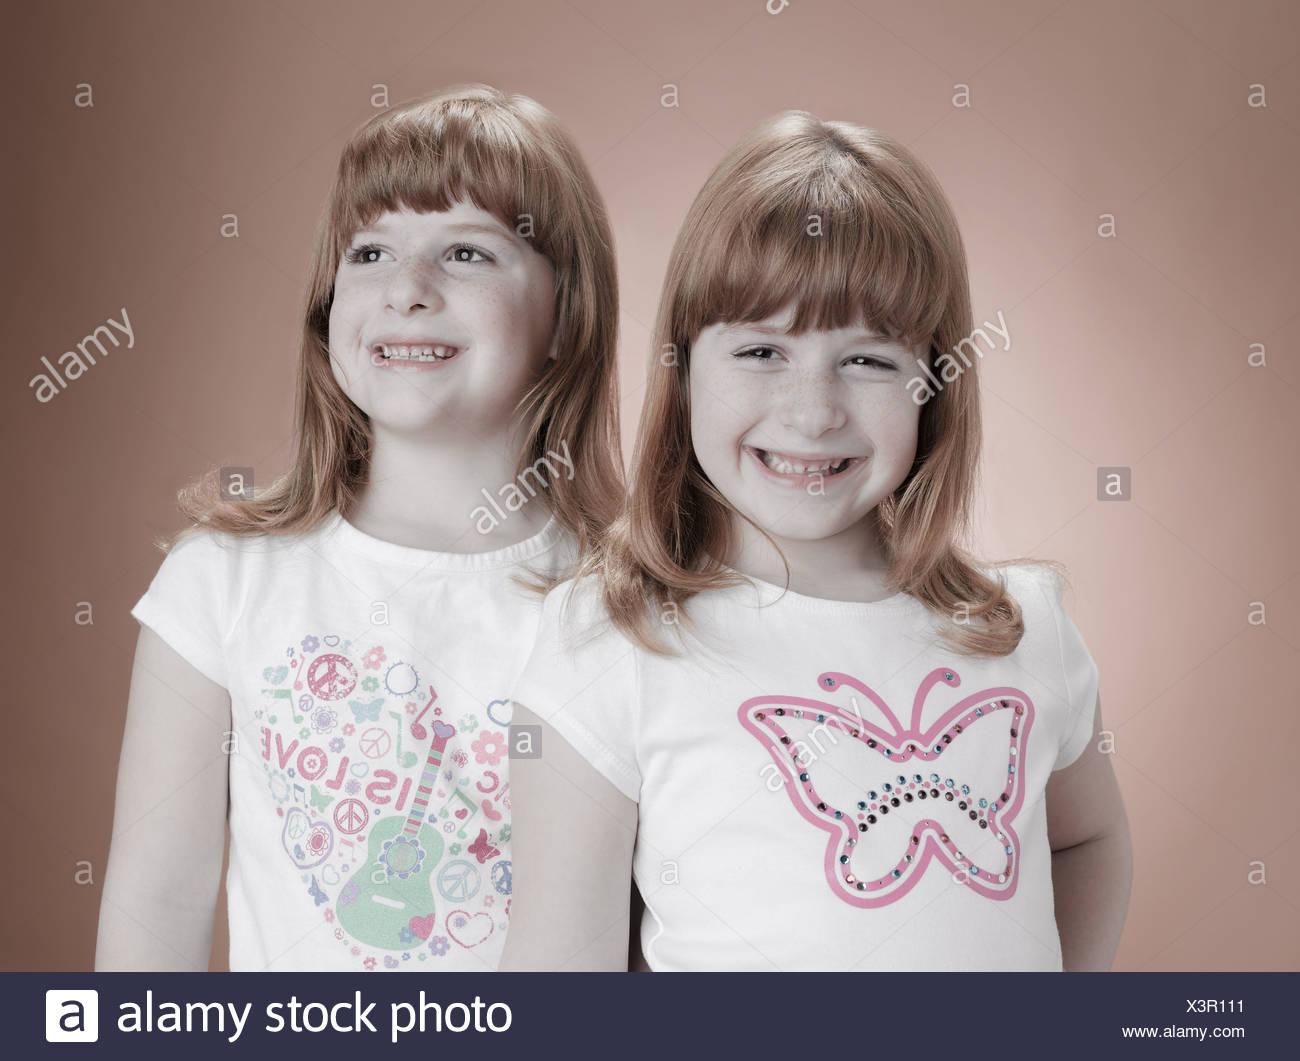 Identical twin girls - Stock Image